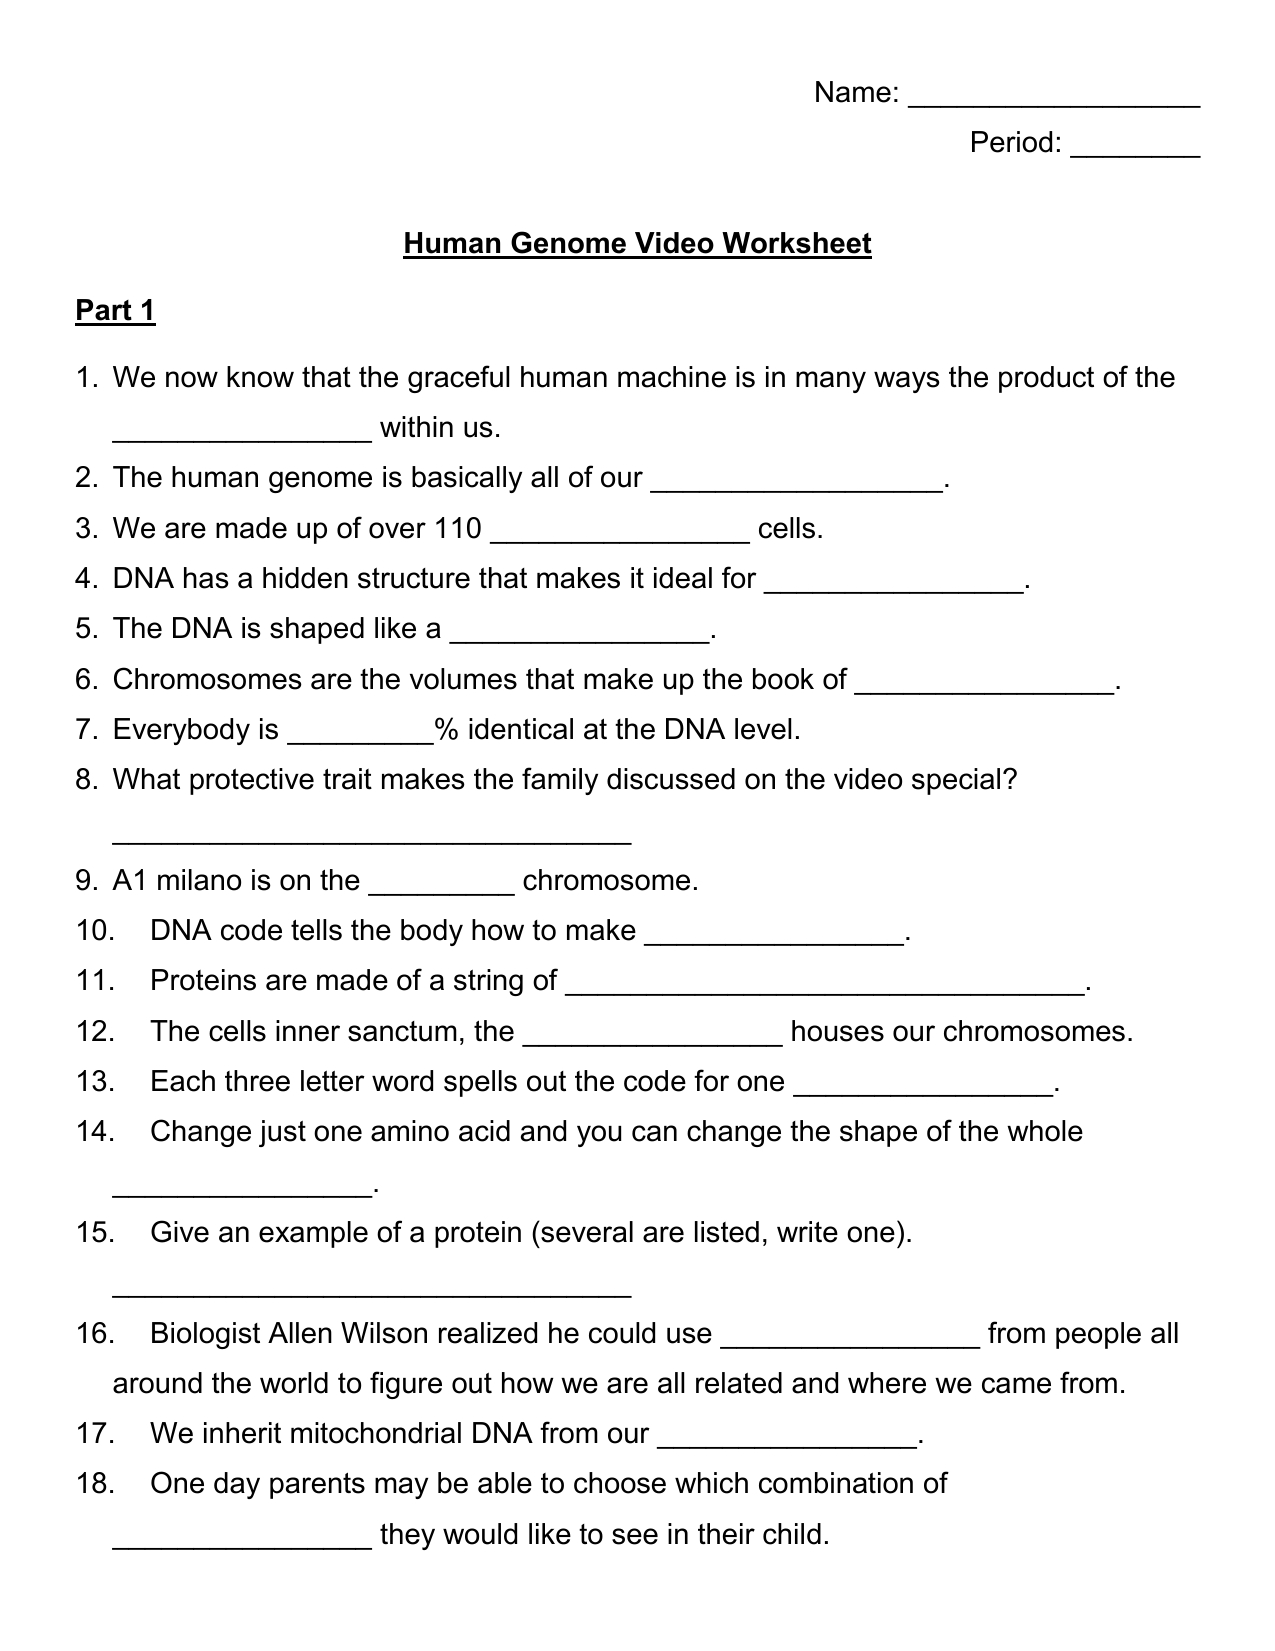 Human Genome Video Guide